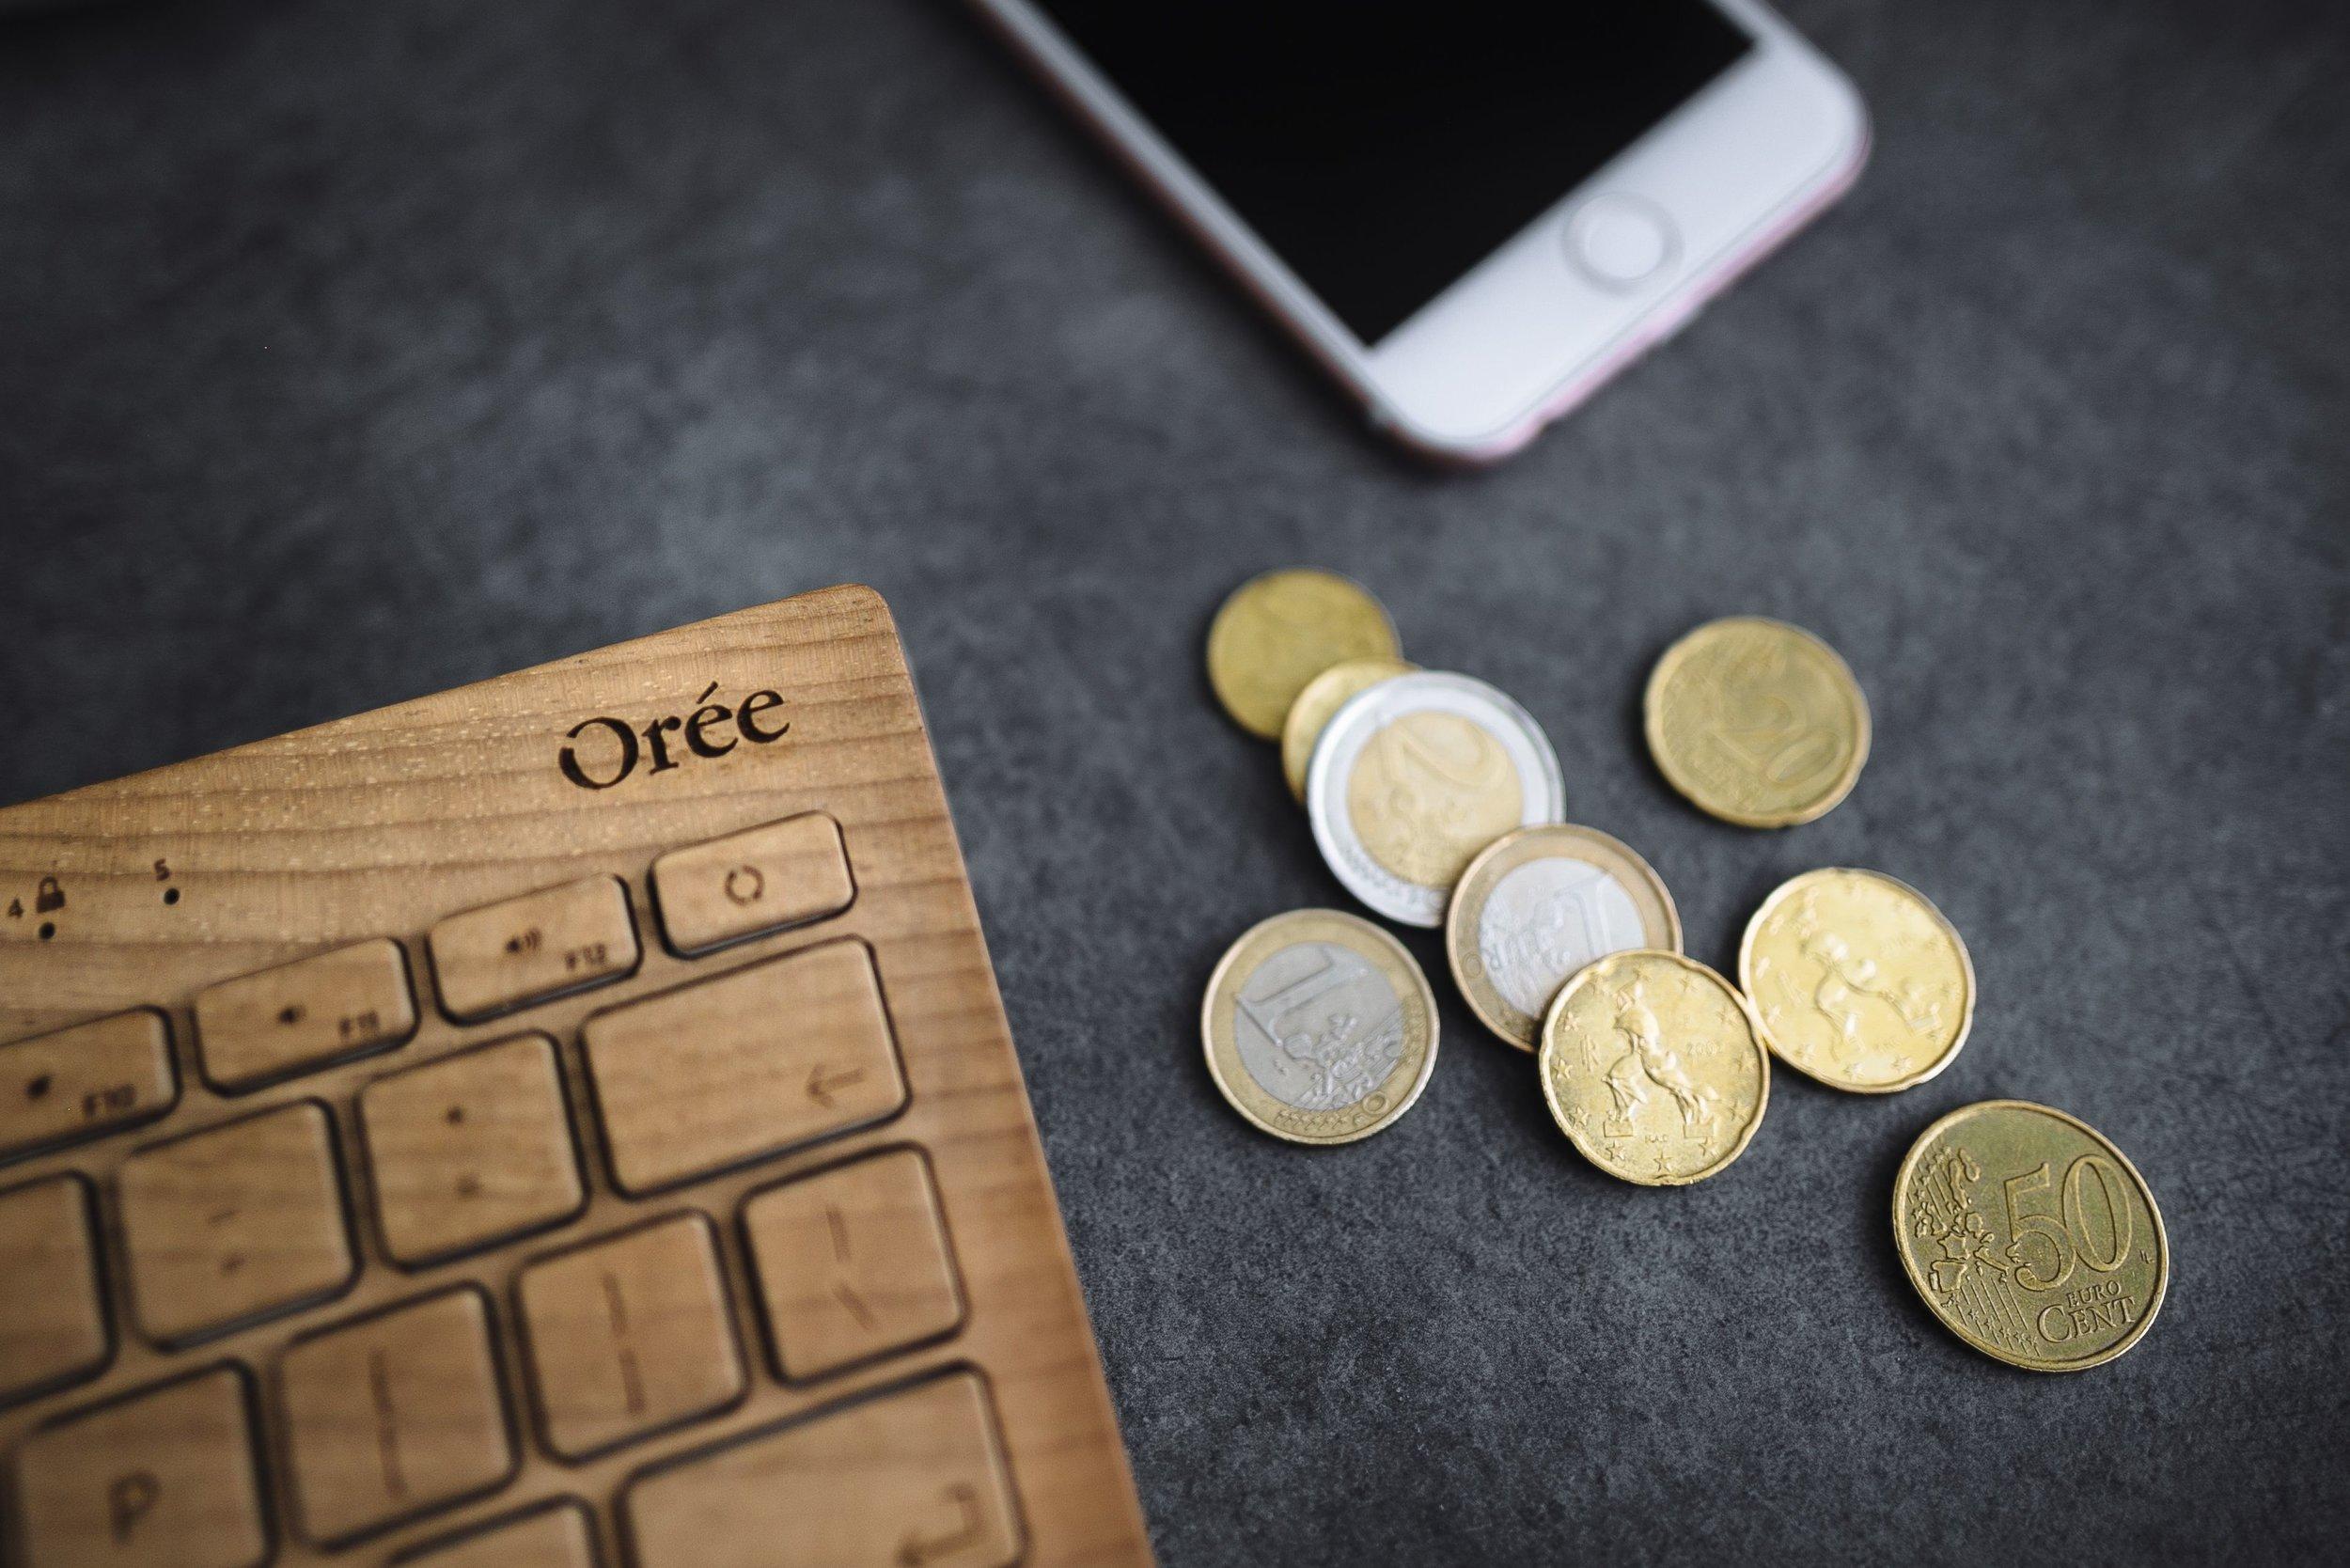 kaboompics_Euro coins.jpg